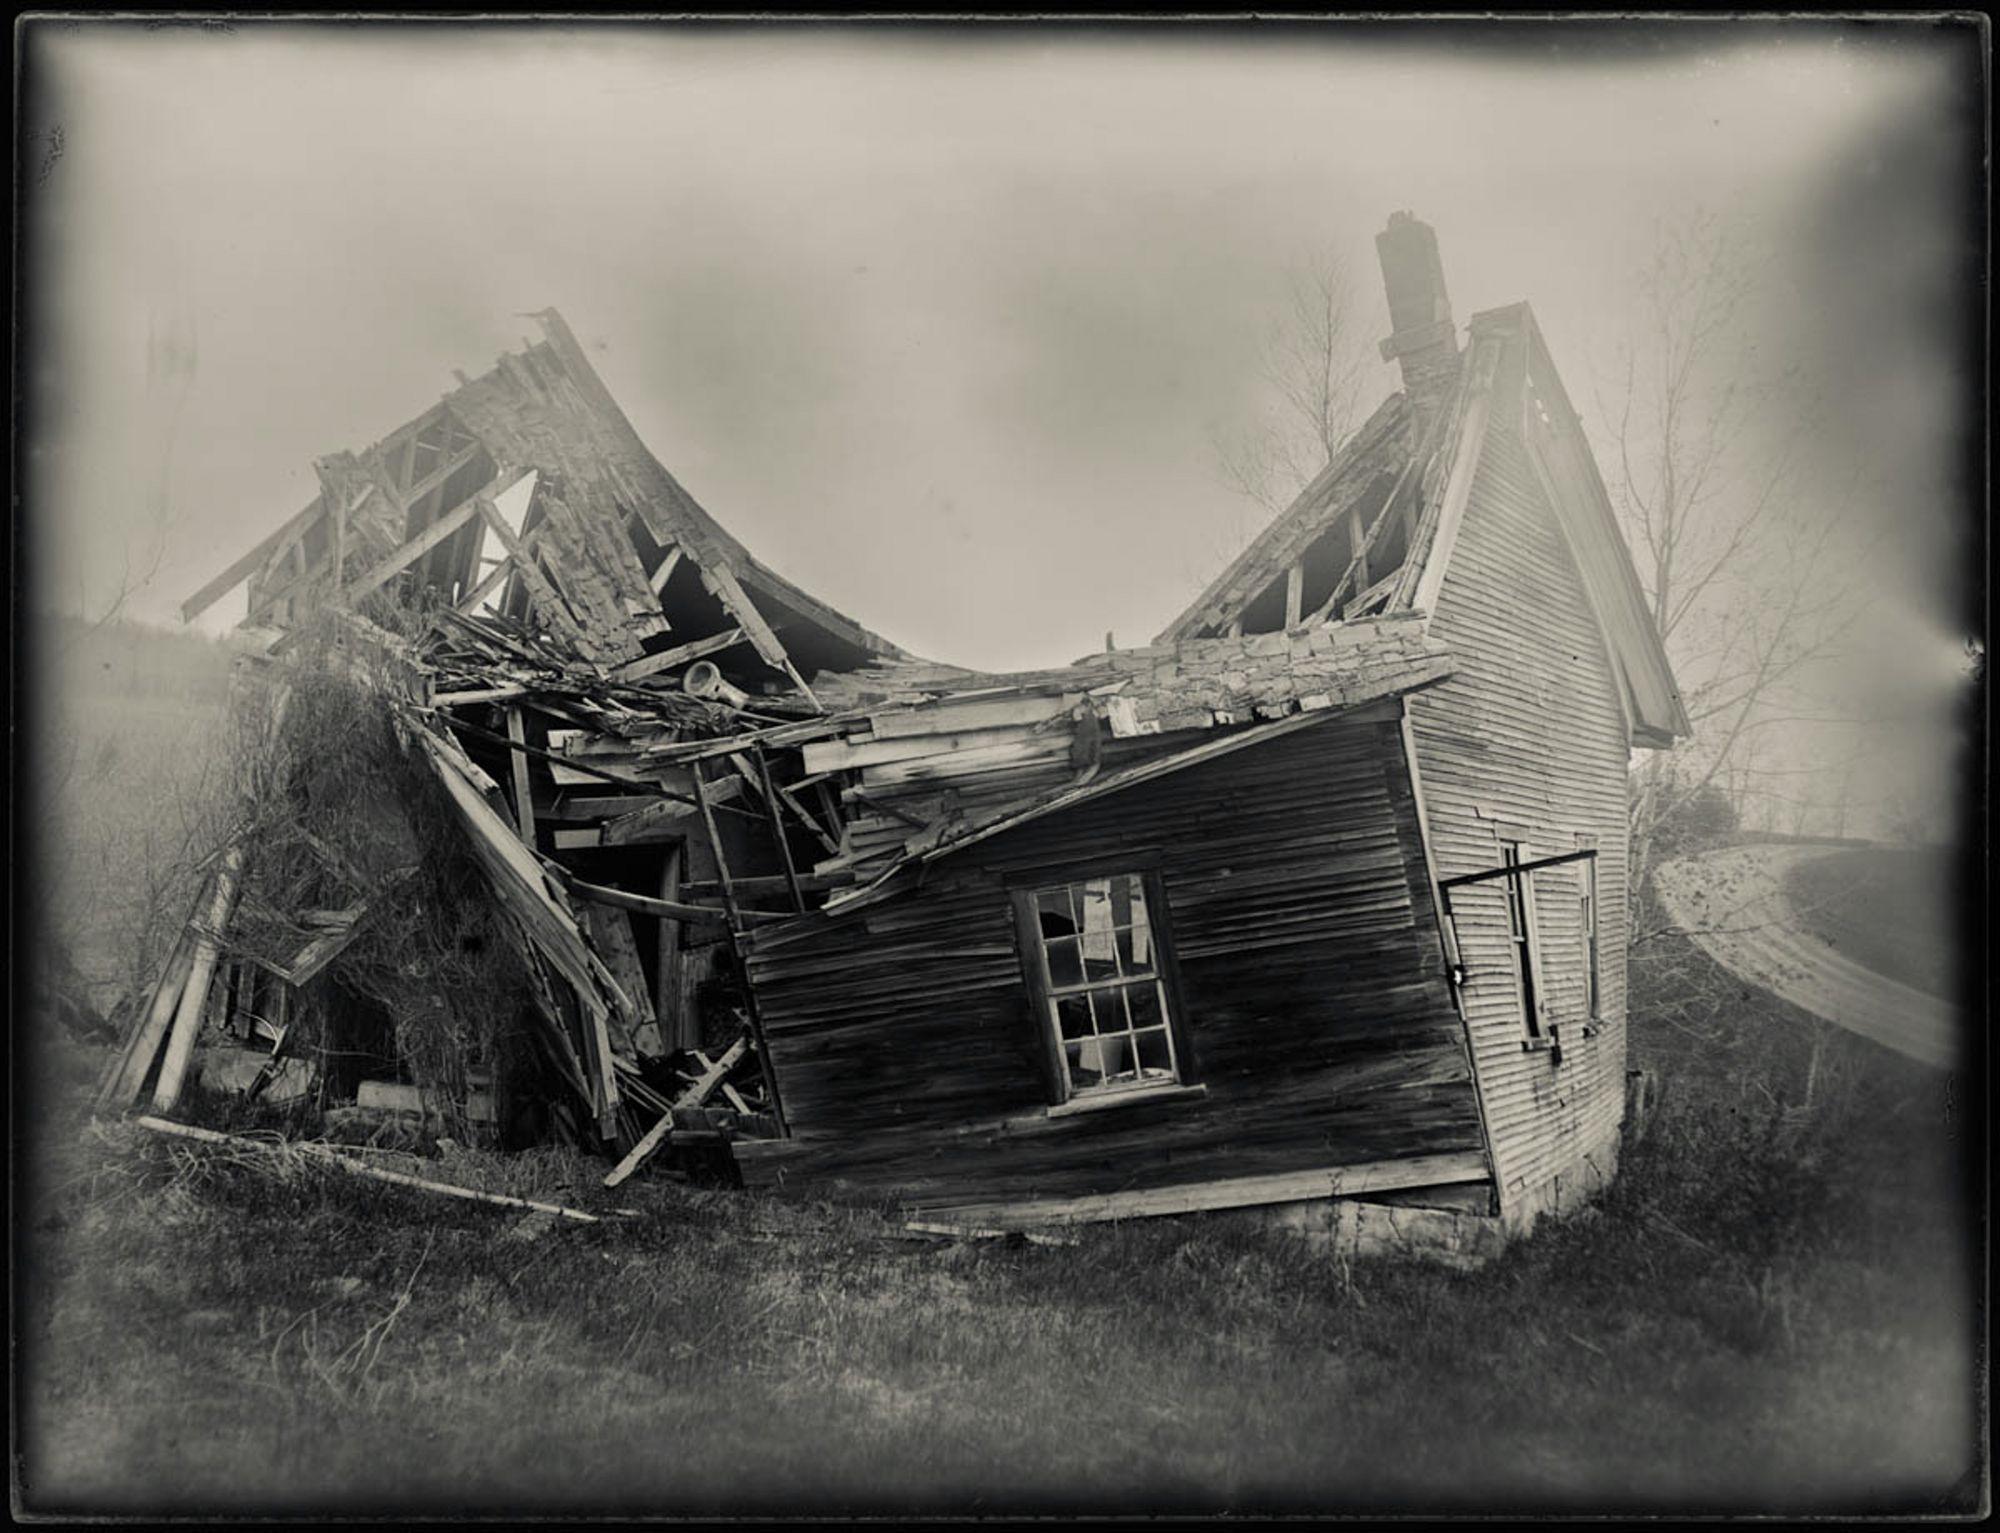 Element - Brian Gaberman: The Road To Wolfeboro